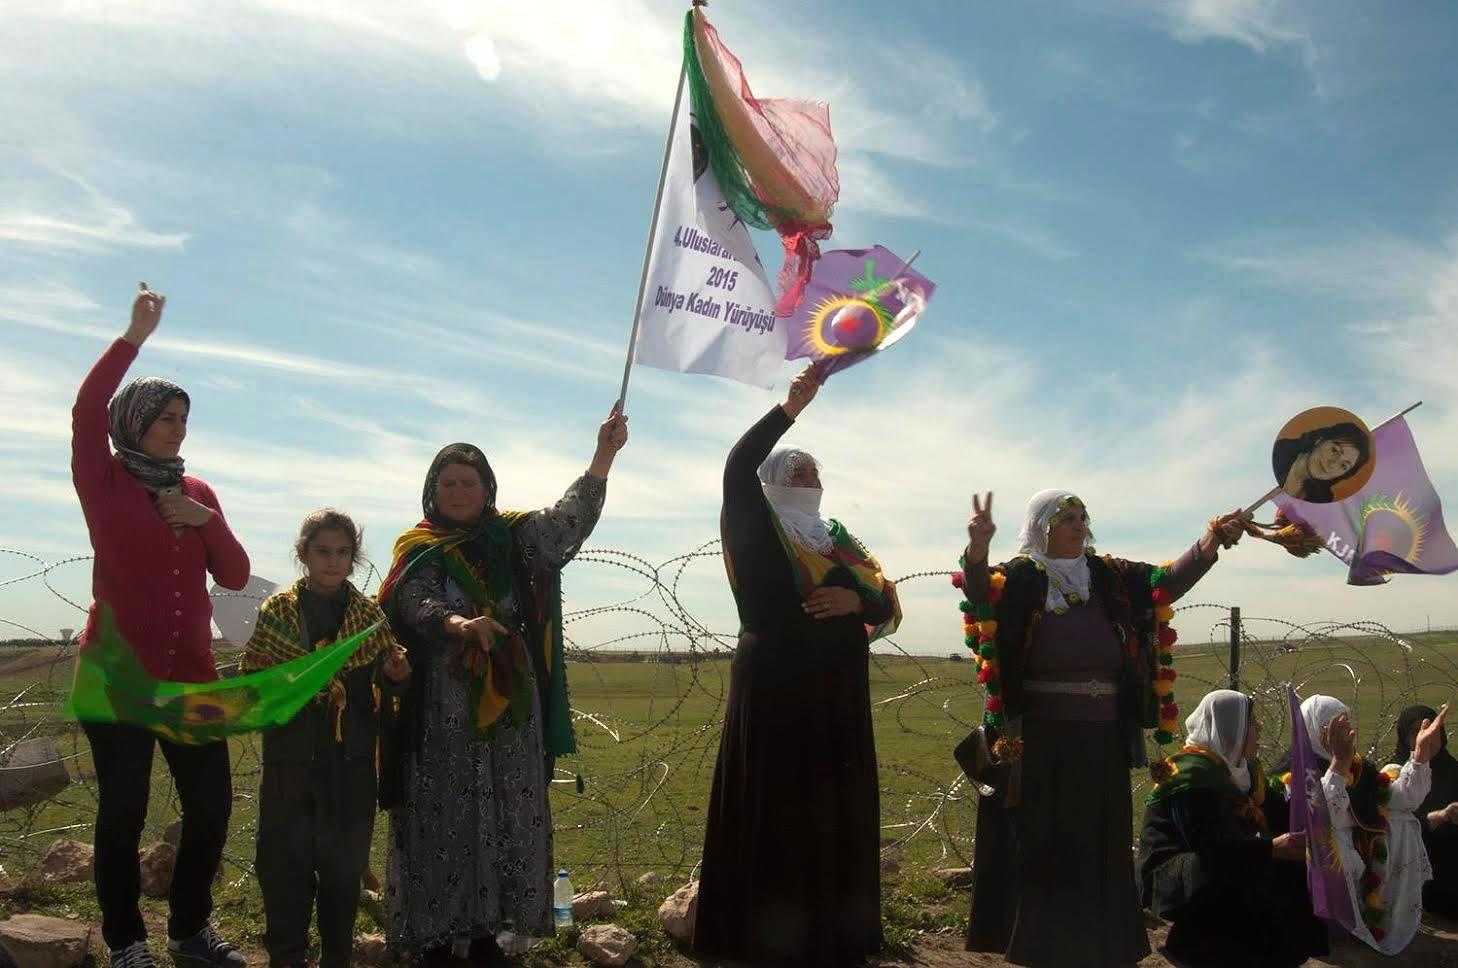 foto:nusajbin border, kurdistan, photo by: feminist caravan